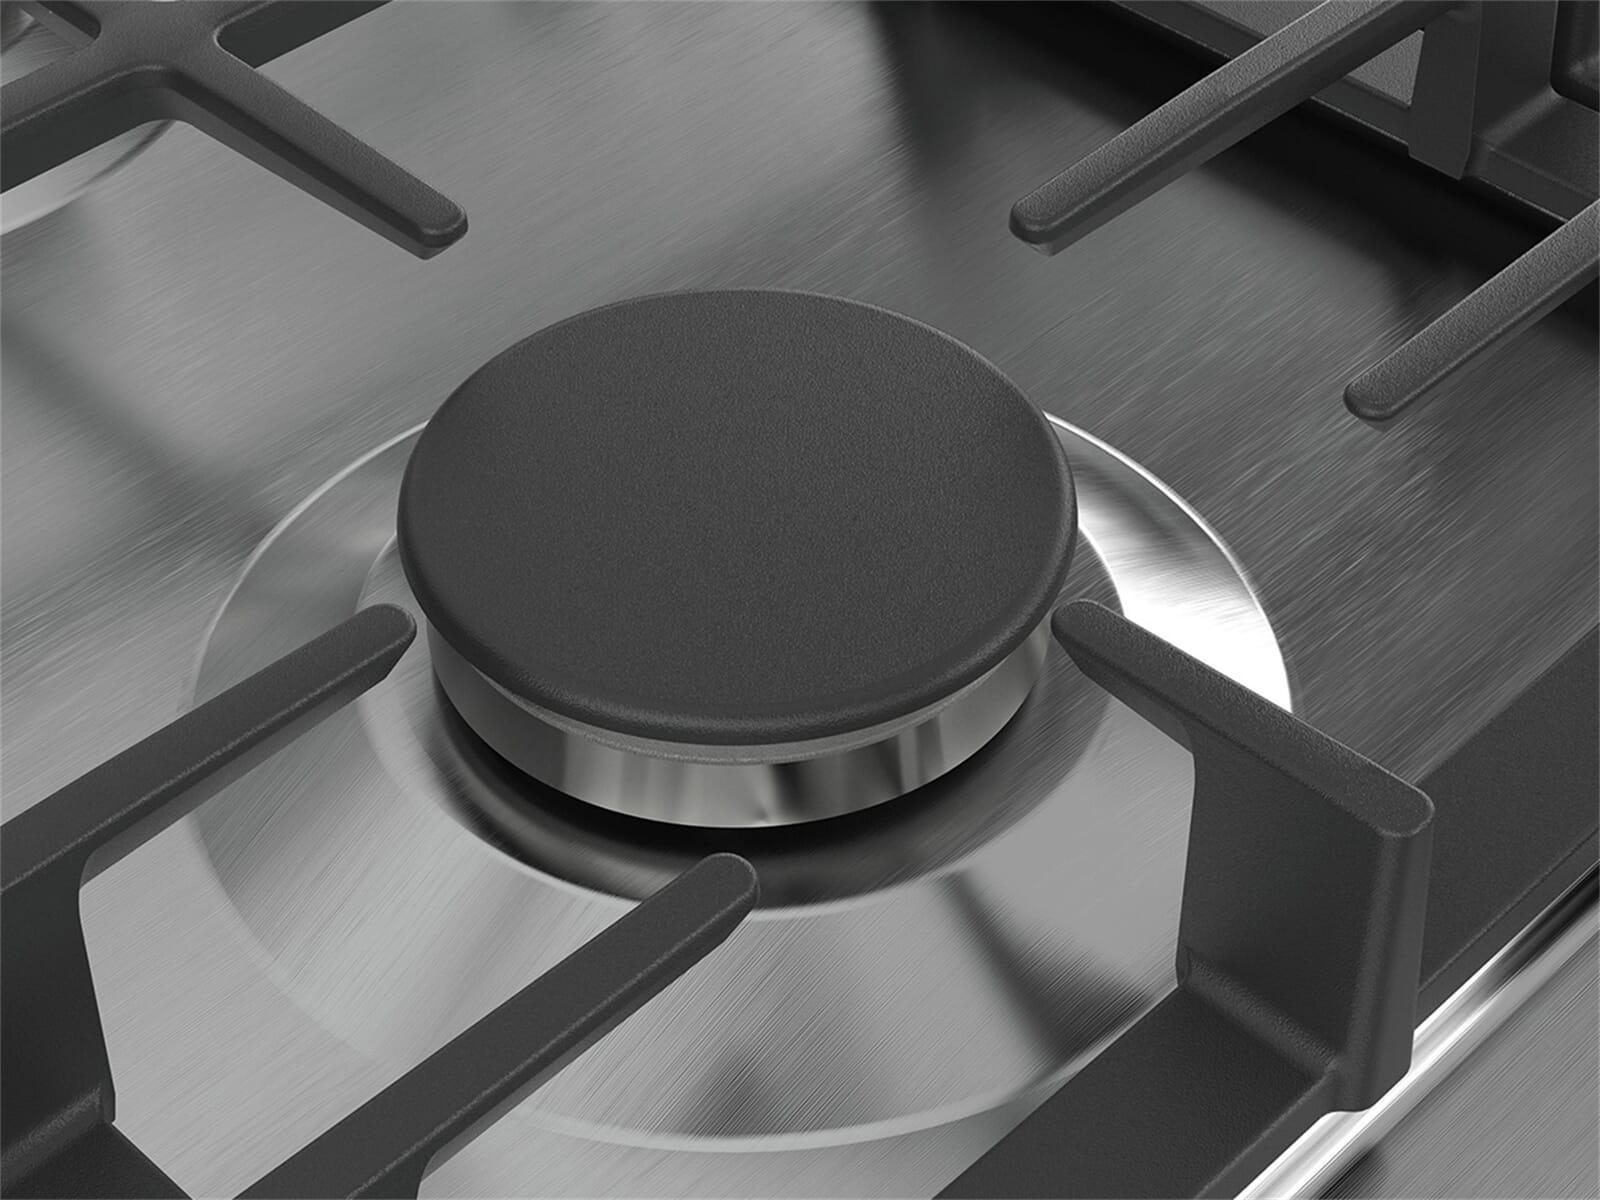 gaskochfeld autark simple gaskochfeld autark cata l ci gas auf glas gasbrennern wok with. Black Bedroom Furniture Sets. Home Design Ideas